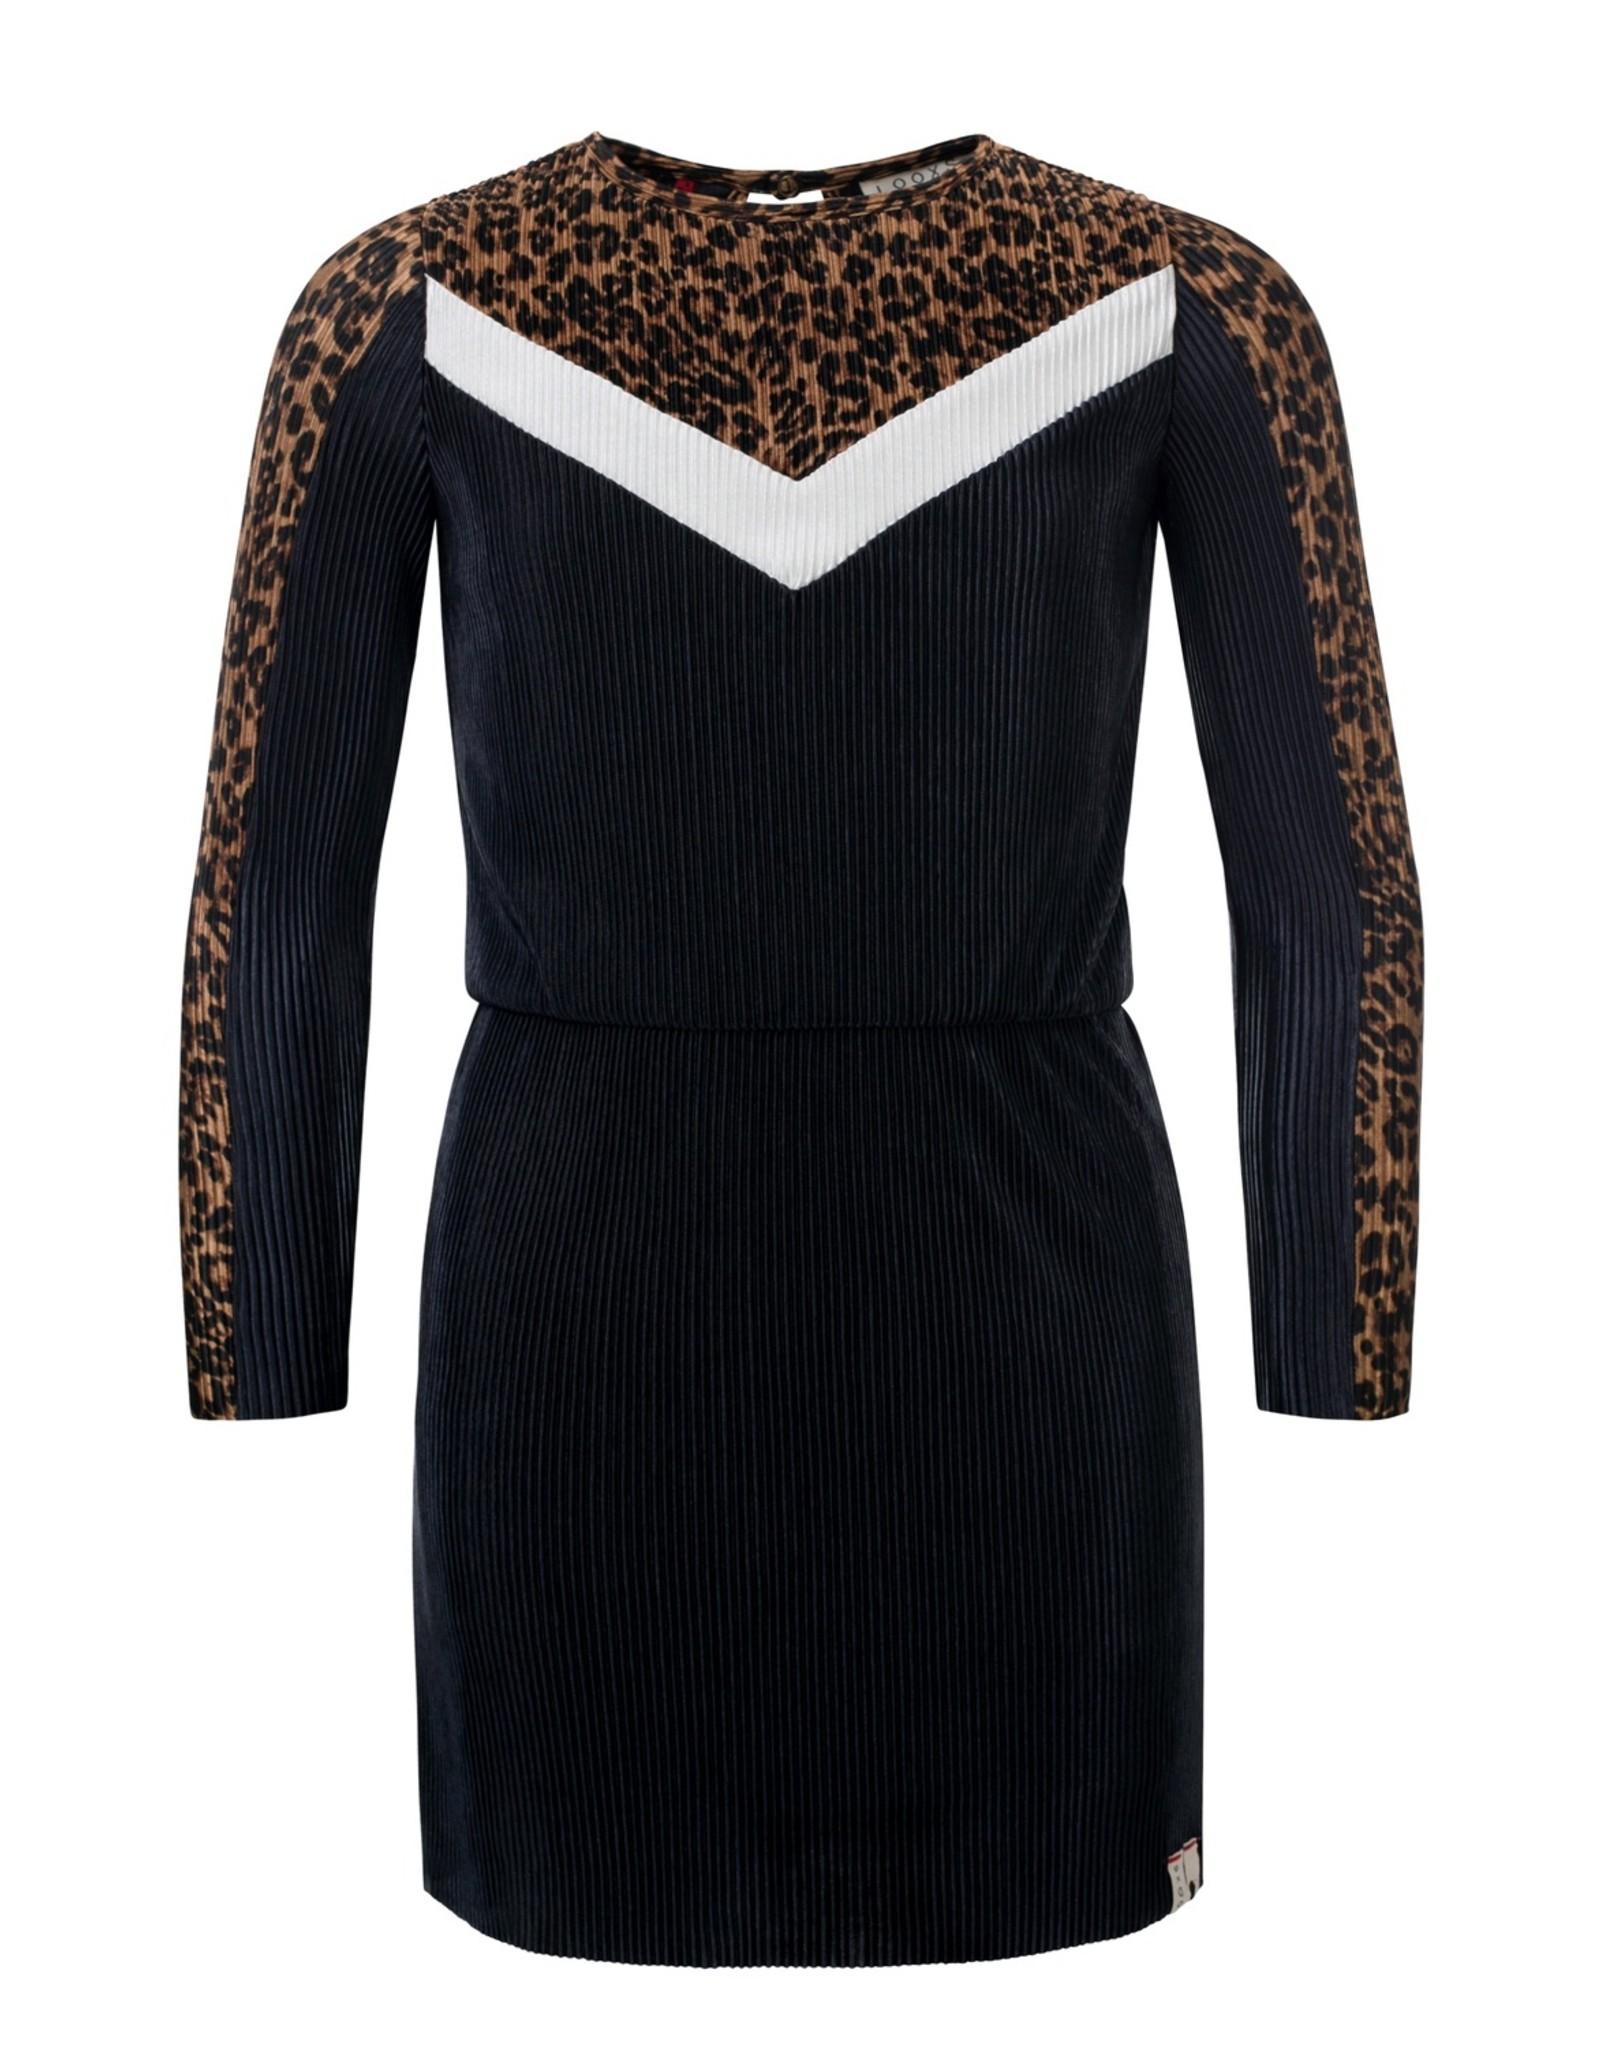 Looxs Revolution Girls Dress maat164